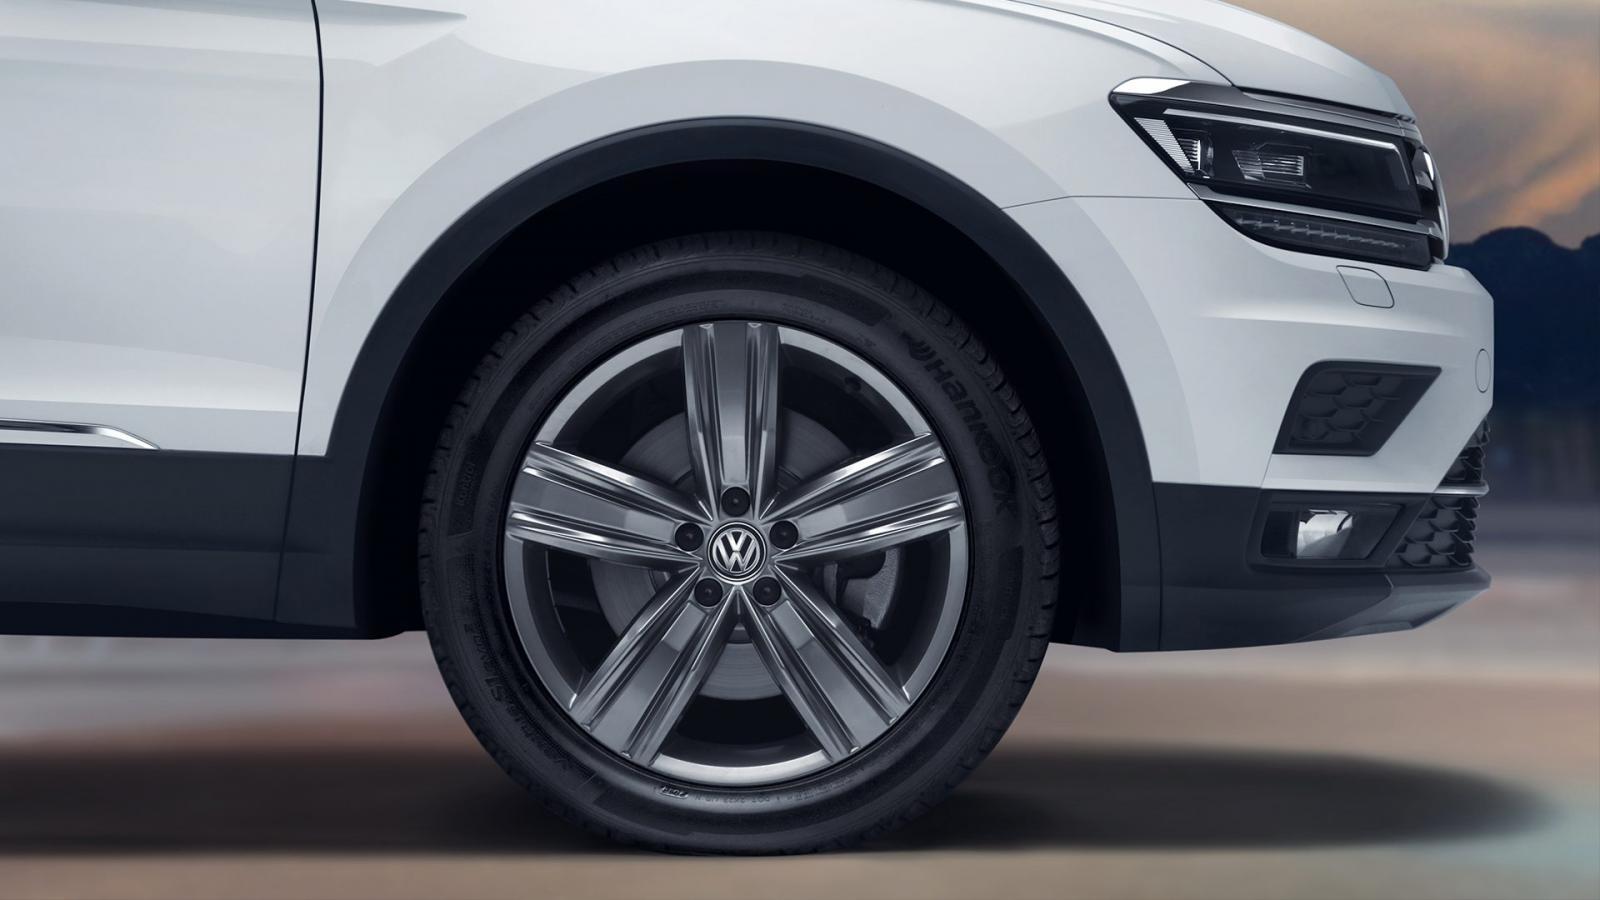 La Volkswagen Tiguan Highline 2019 se quedó muy cerca de ser la SUV perfecta